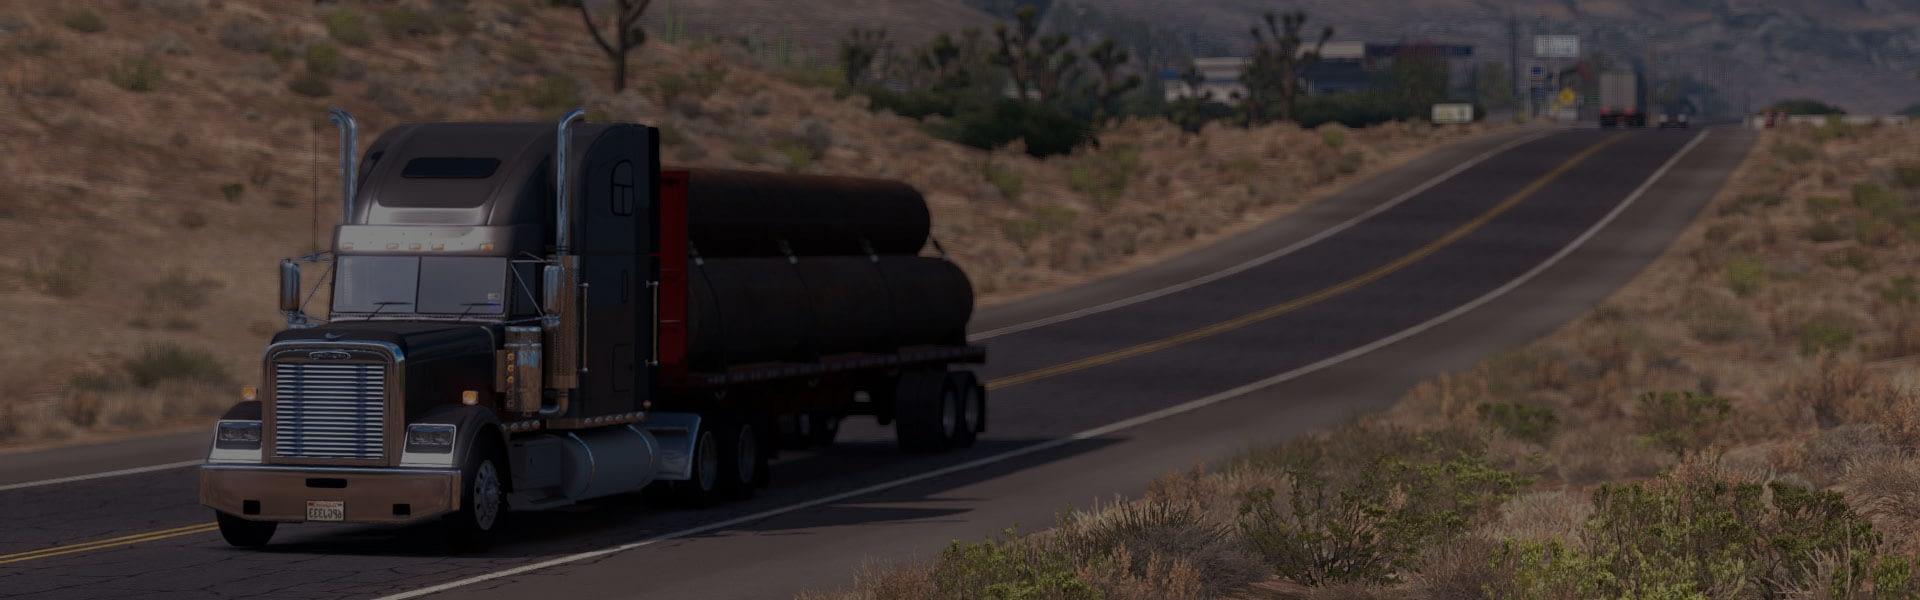 american truck simulator freightliner xl classic